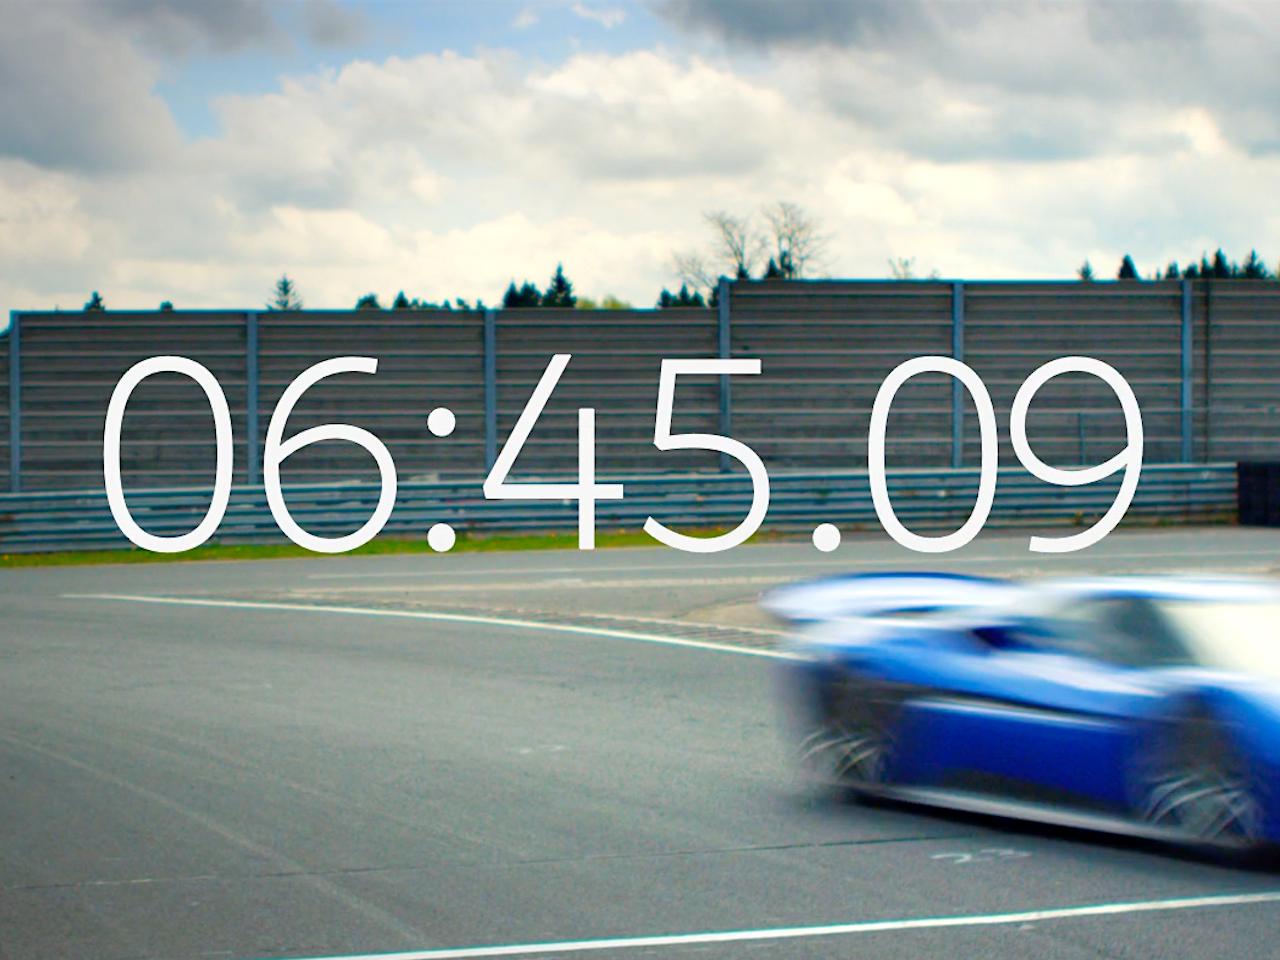 NIO. Nurburgring EP9 Record. (teaser)